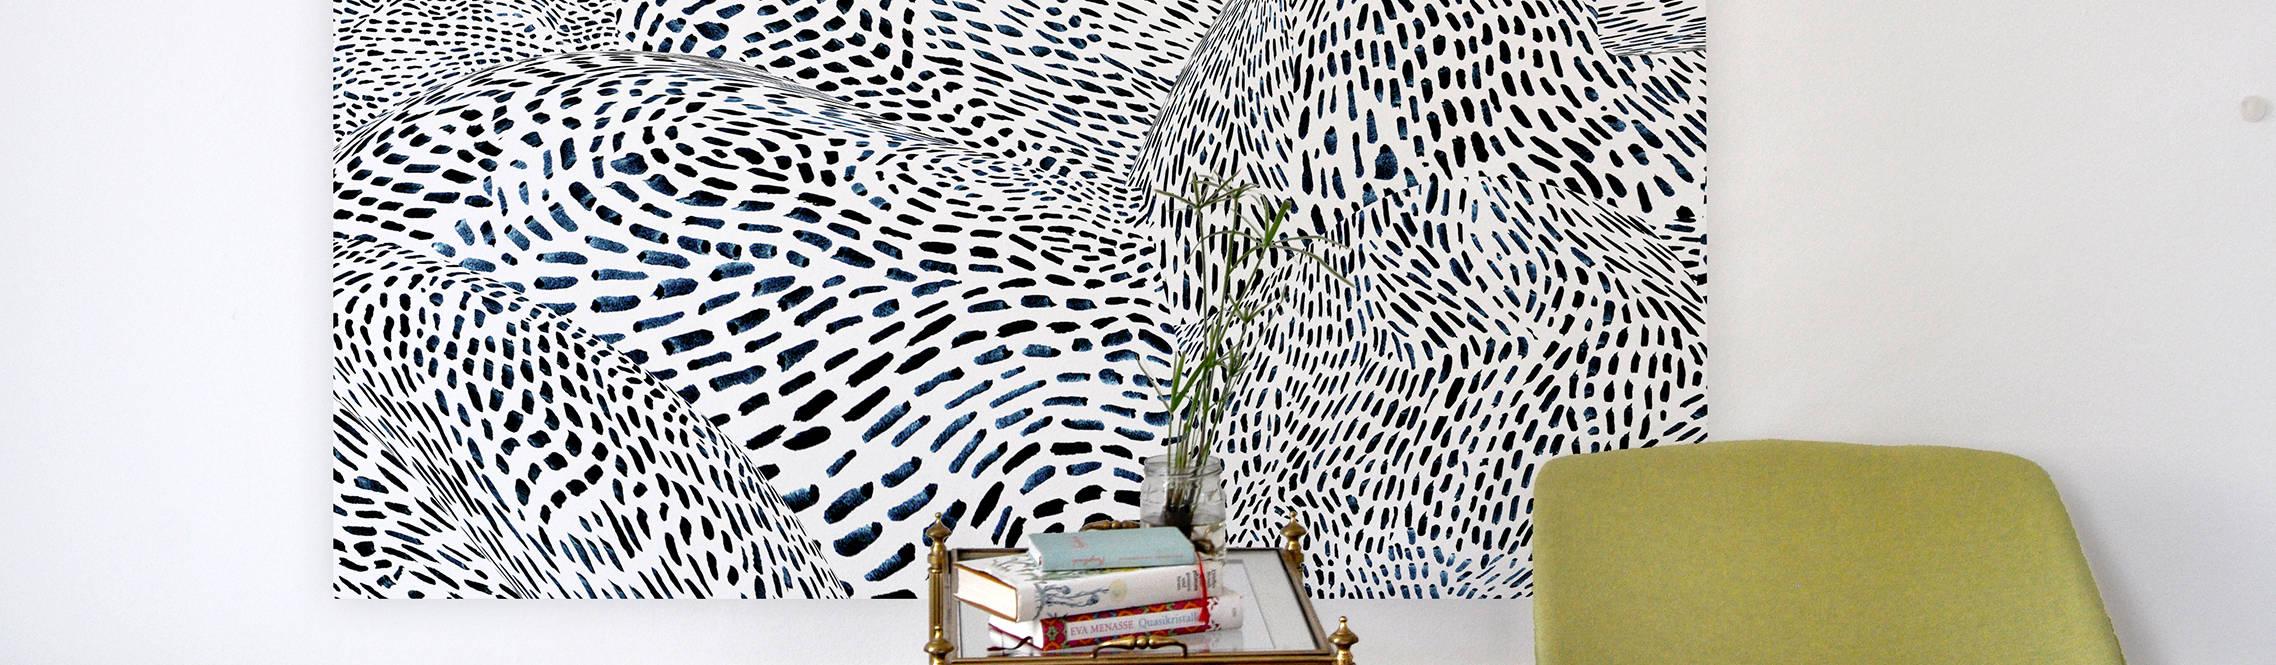 kollektiv vier – Surface and Textile Design